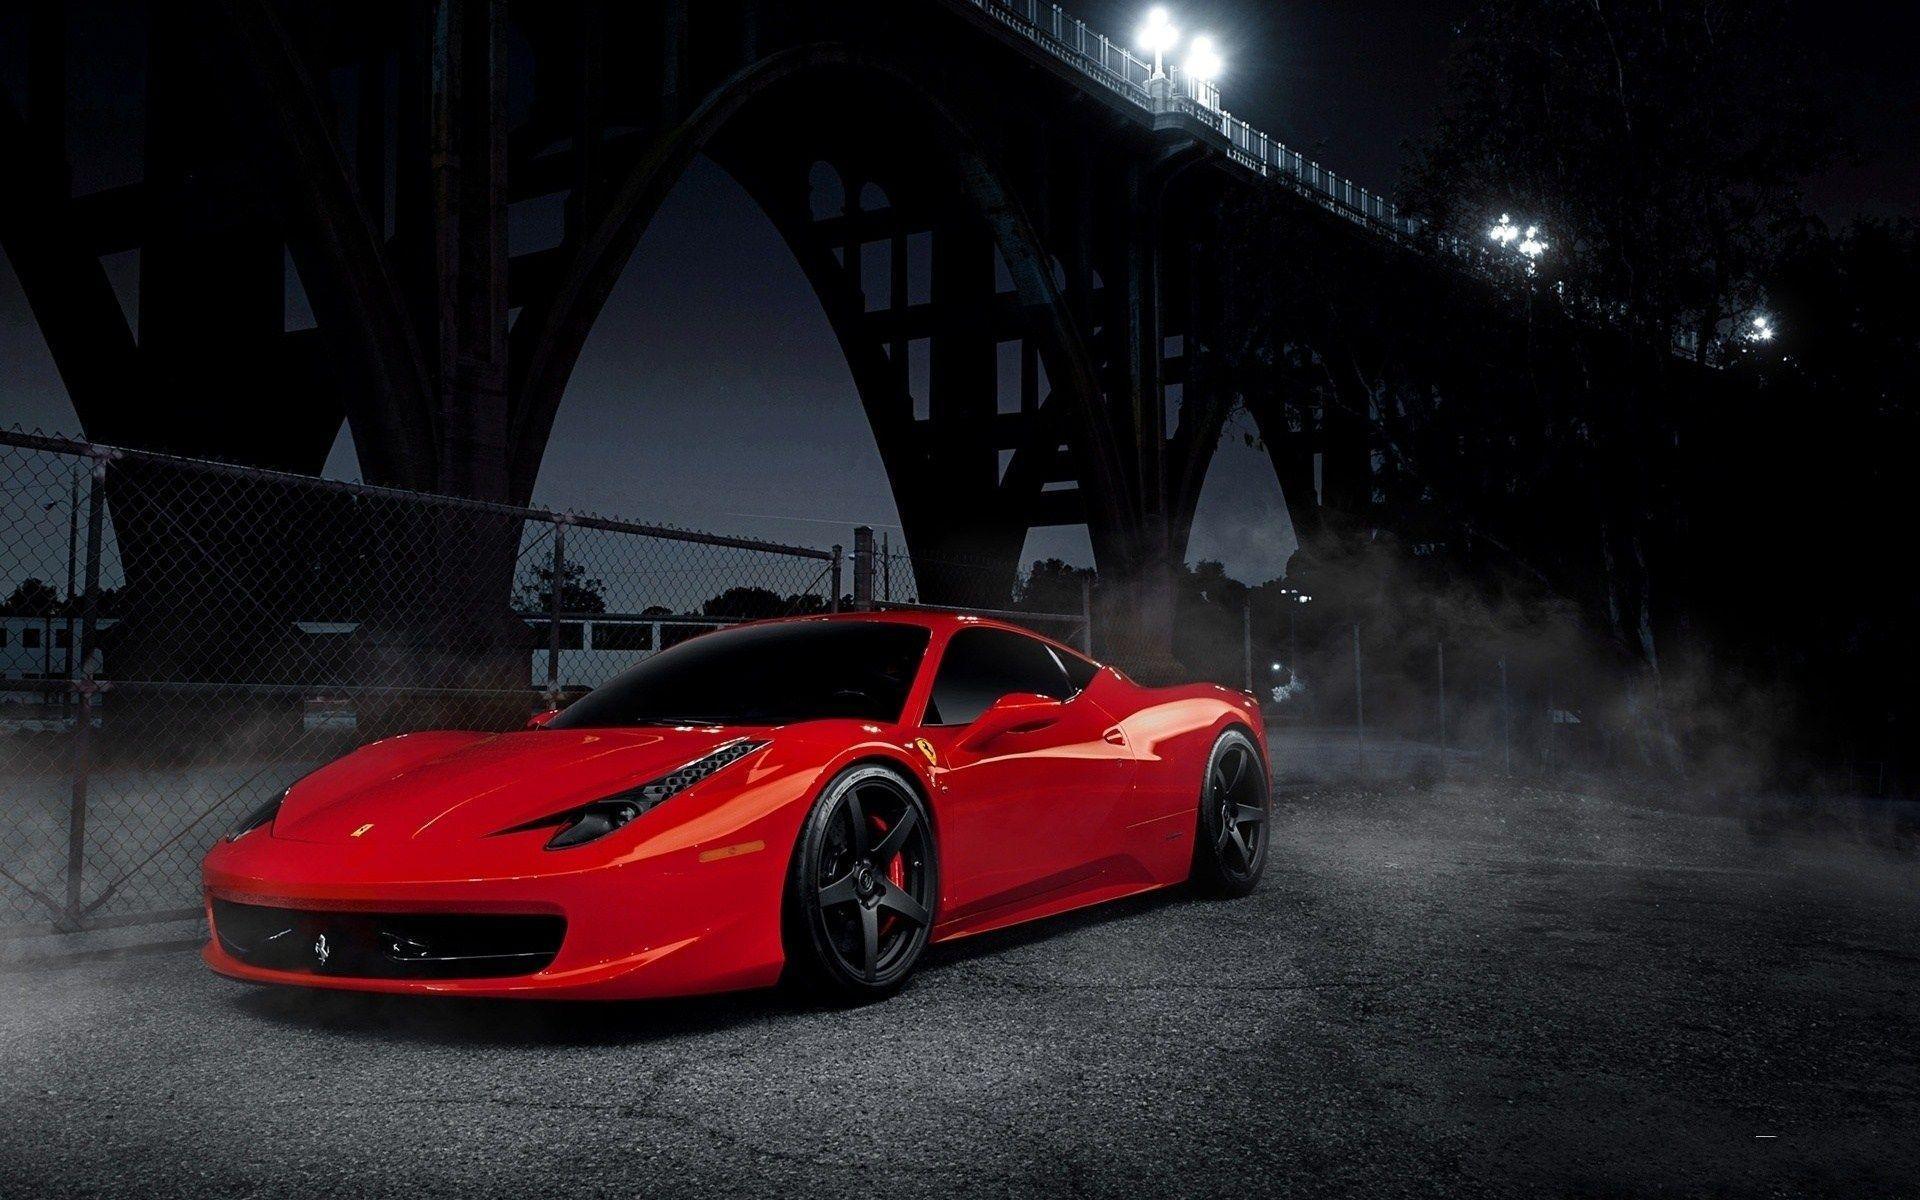 Ferrari 458 italia hd wallpapers wallpaper cave 95 ferrari 458 italia wallpapers ferrari 458 italia backgrounds vanachro Image collections